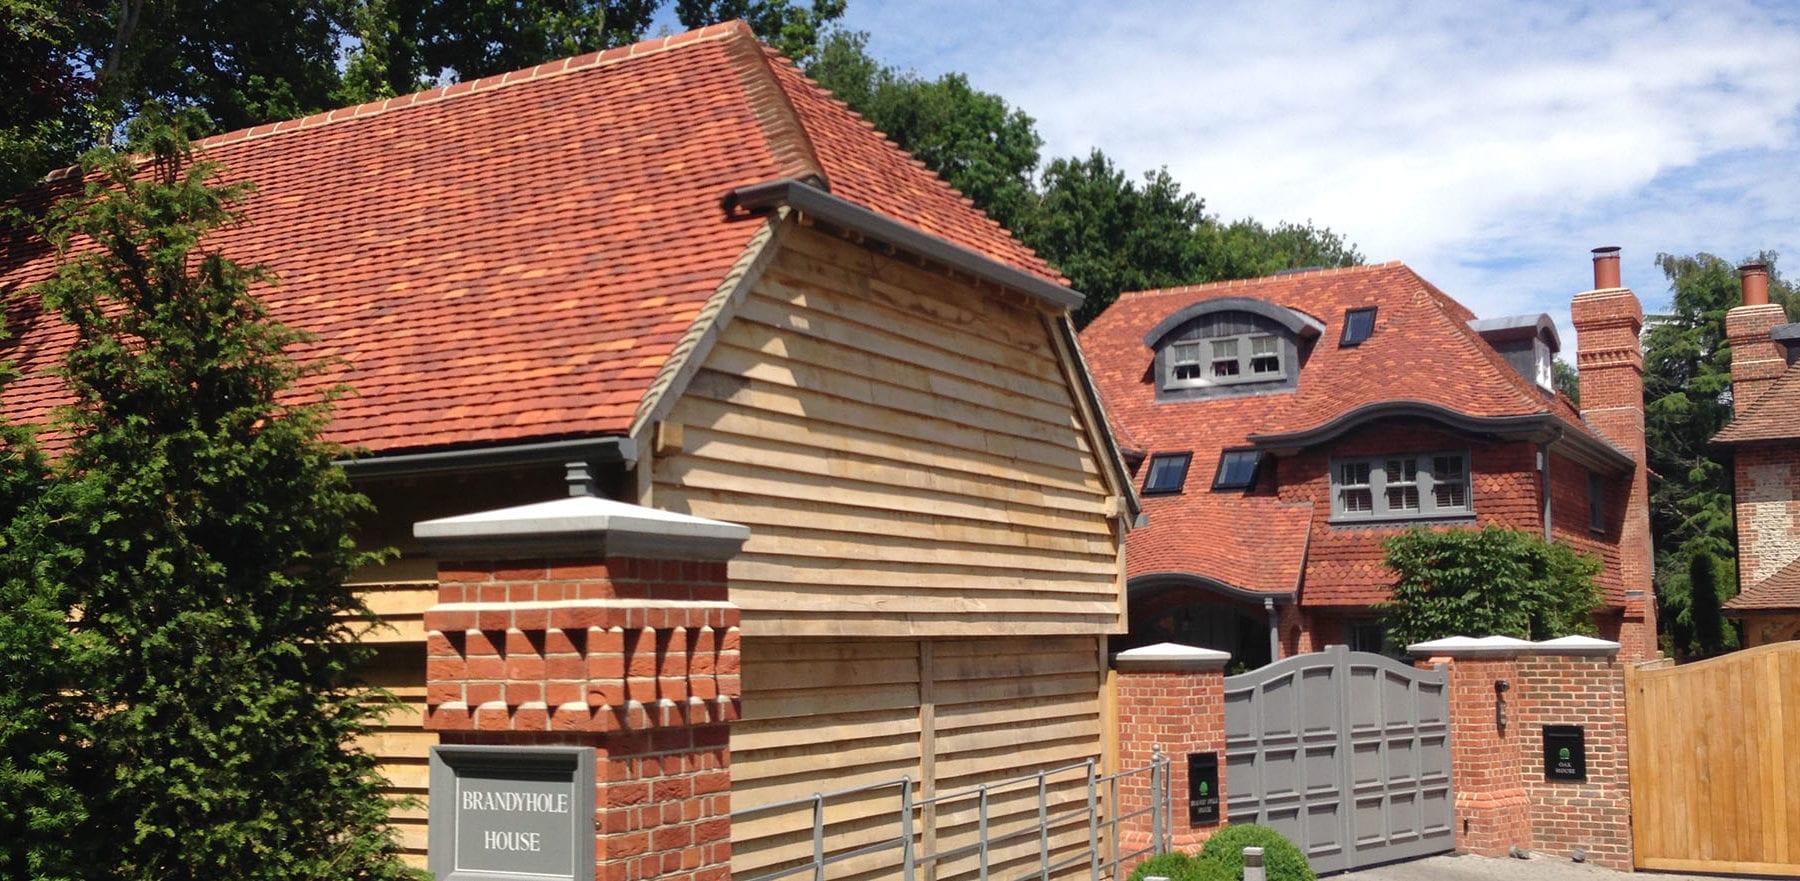 Lifestiles - Handmade Bespoke Clay Roof Tiles - Chichester, England 5